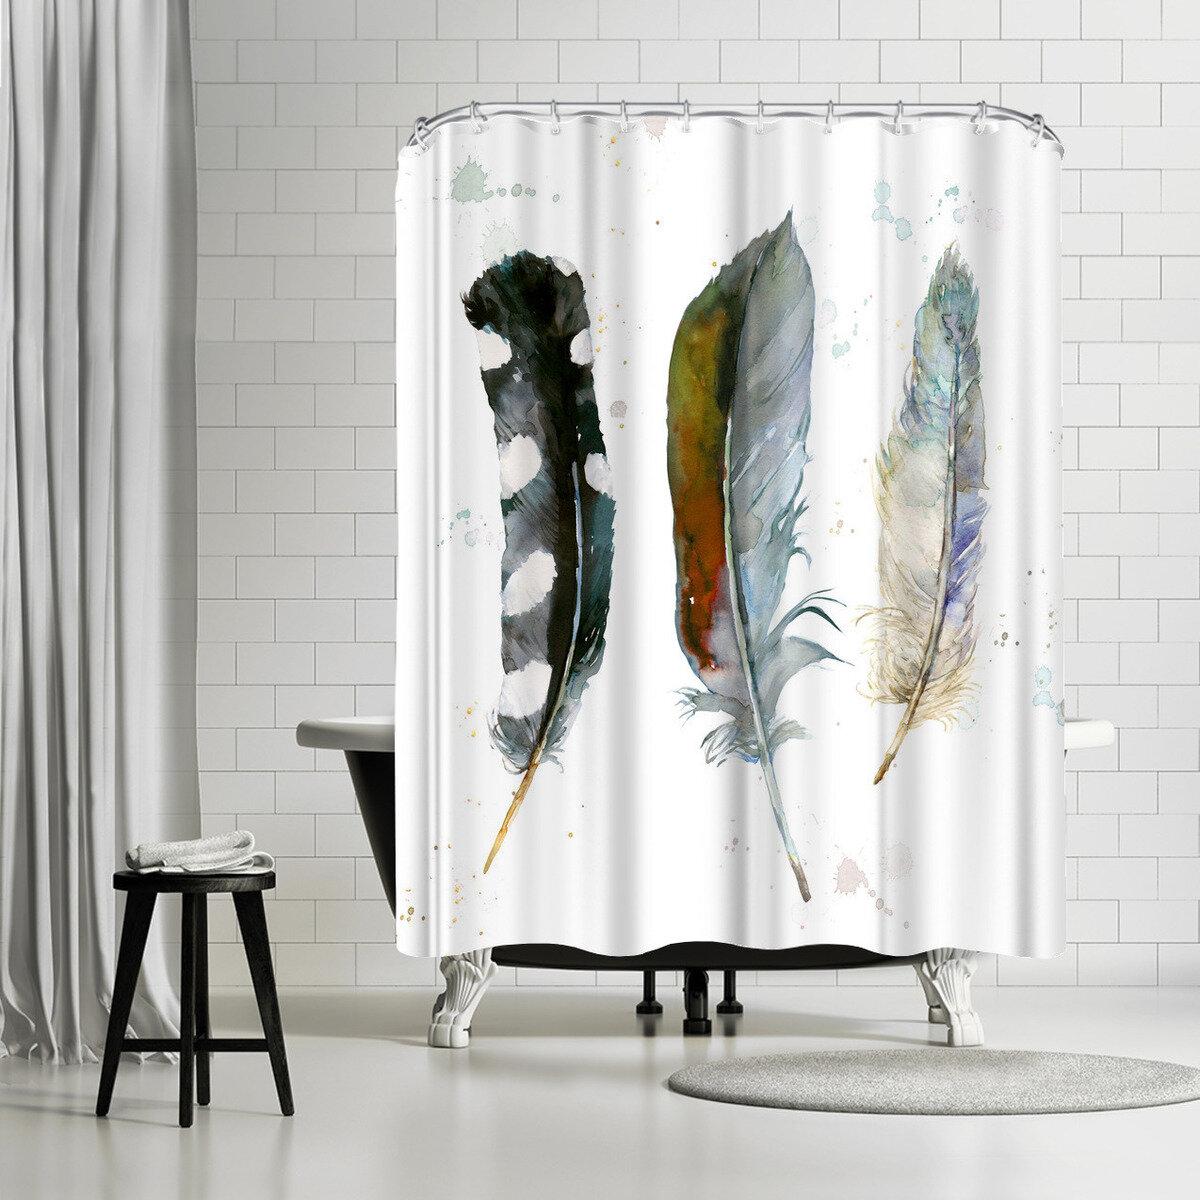 East Urban Home Harrison Ripley Feathers Shower Curtain